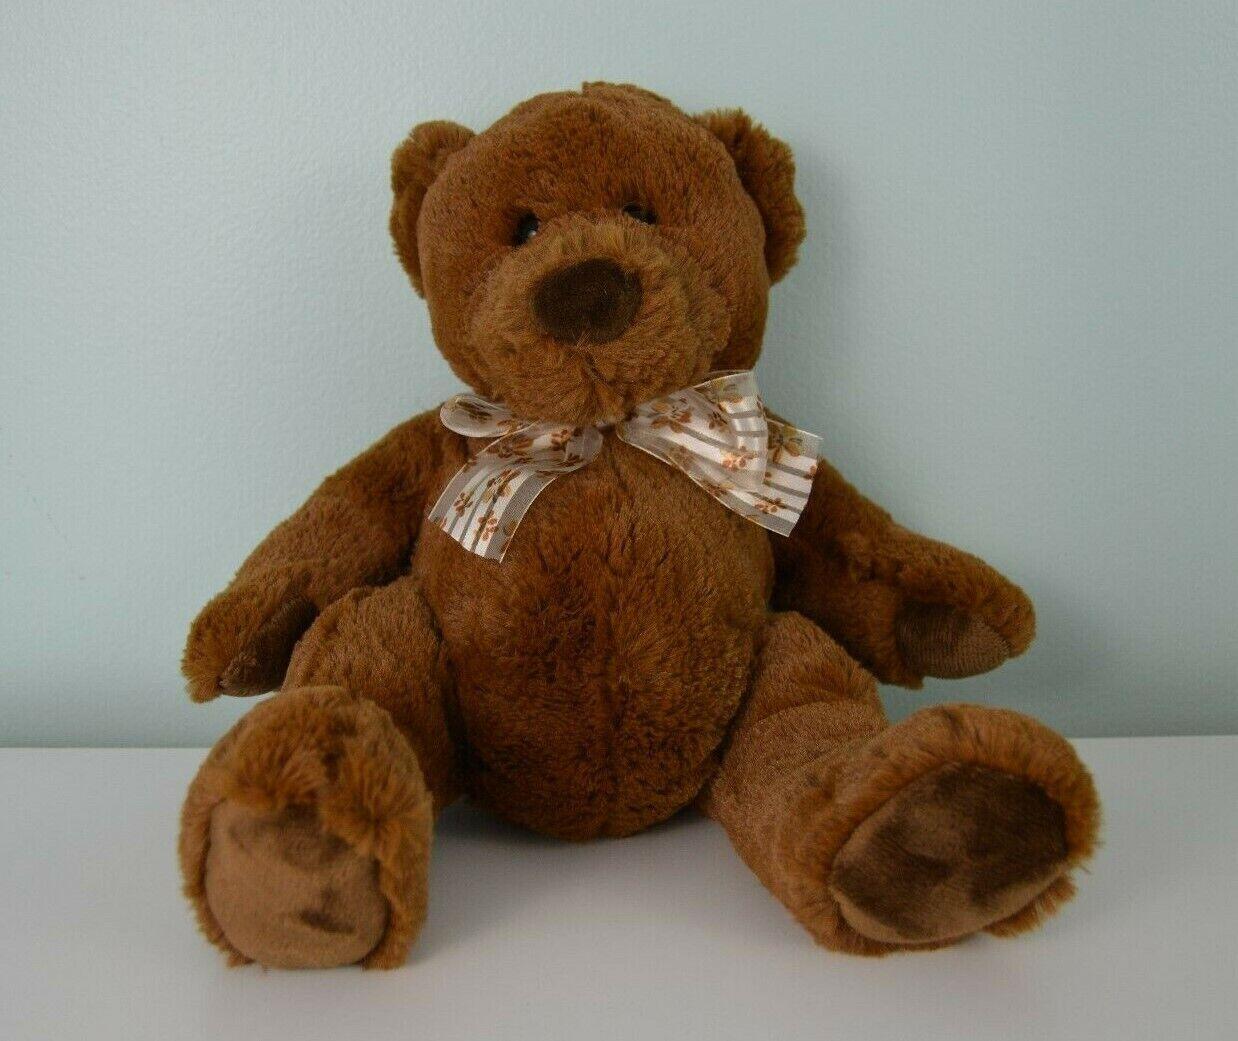 Walmart Stores Teddy Bear Plush Stuffed Animal Toy Brown Floral Stripe Bow 9